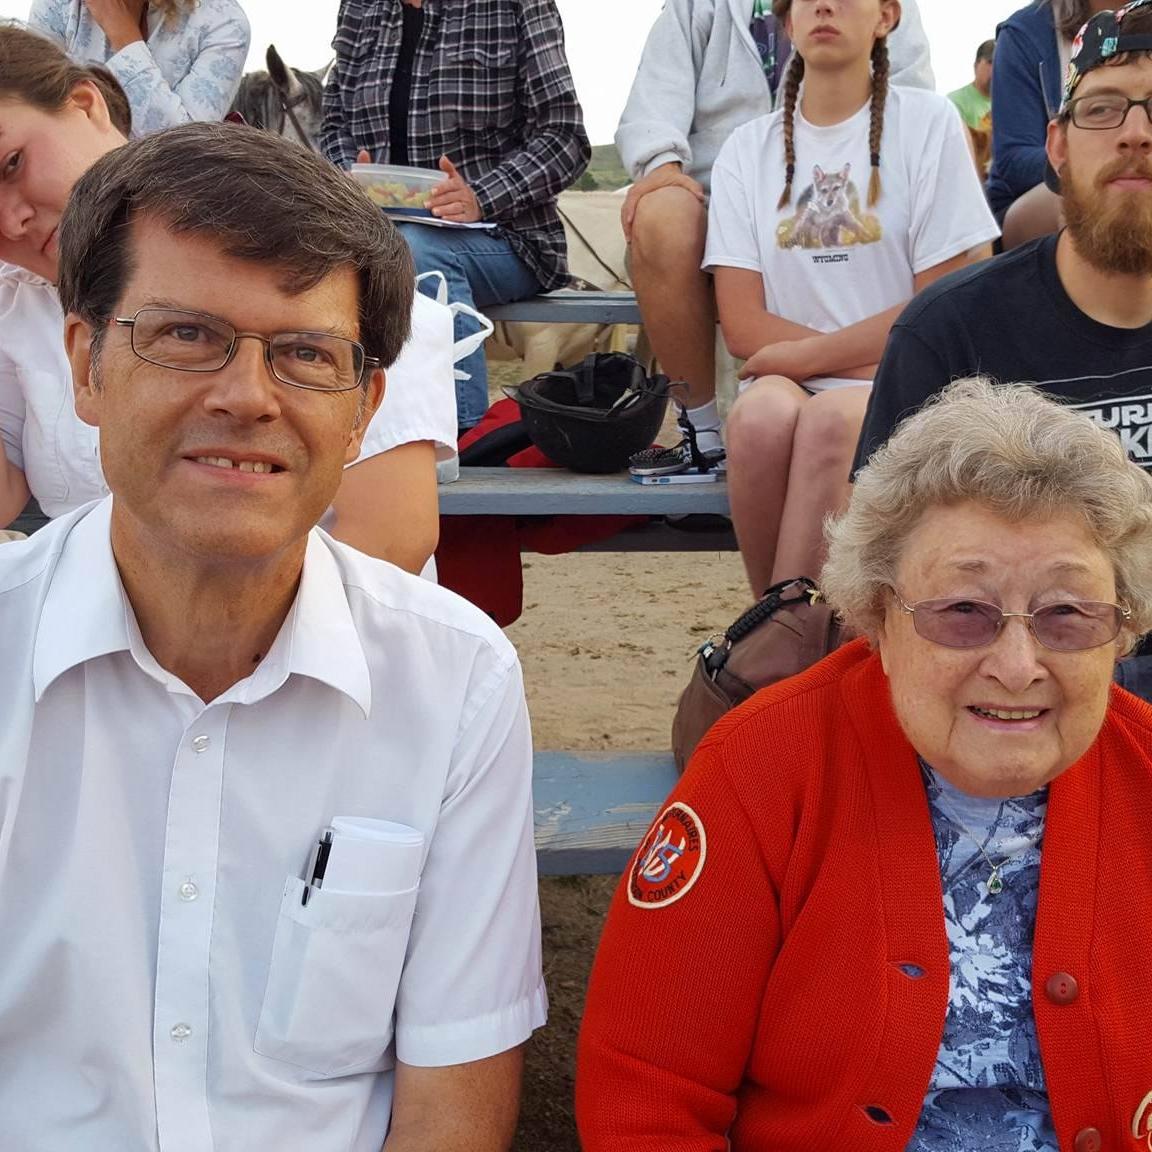 Alumnus Bob Parson with Mrs. Peg Easley at Alumni Week 2017